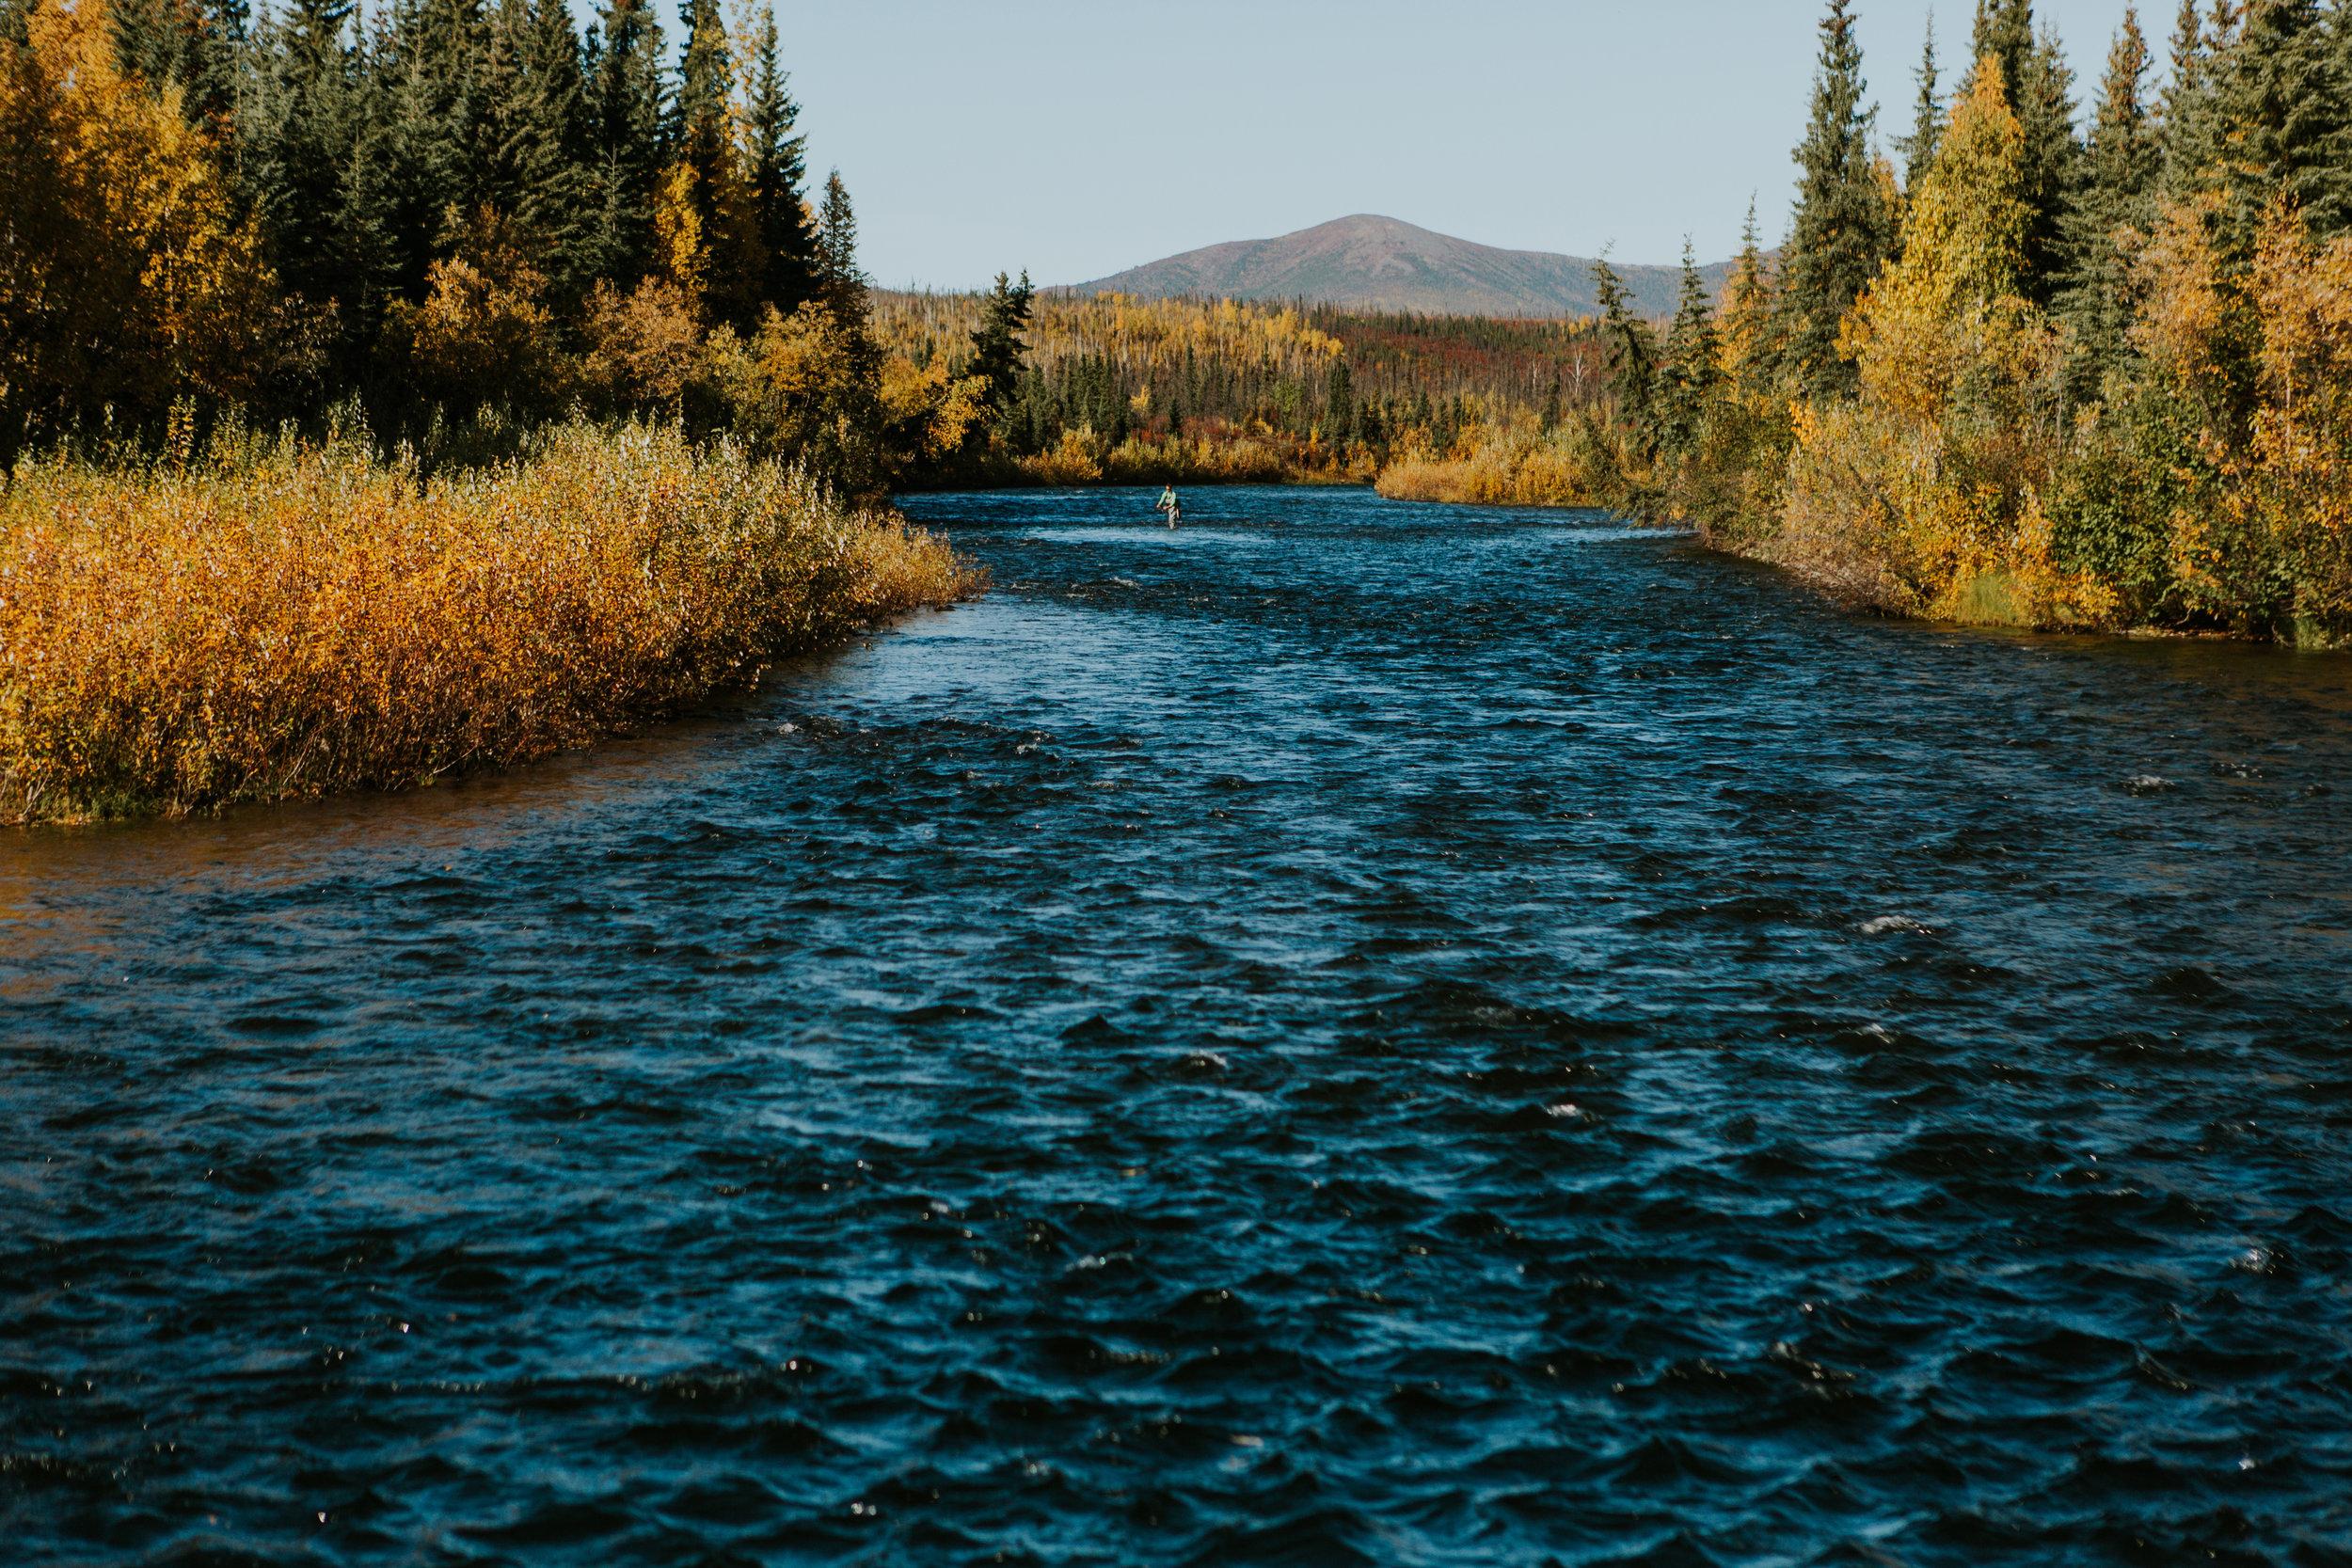 CindyGiovagnoli_Alaska_KoyukukRiver_SukakpakMountain_JimRiver_ArcticCircle_fly_fishing_September-061.jpg